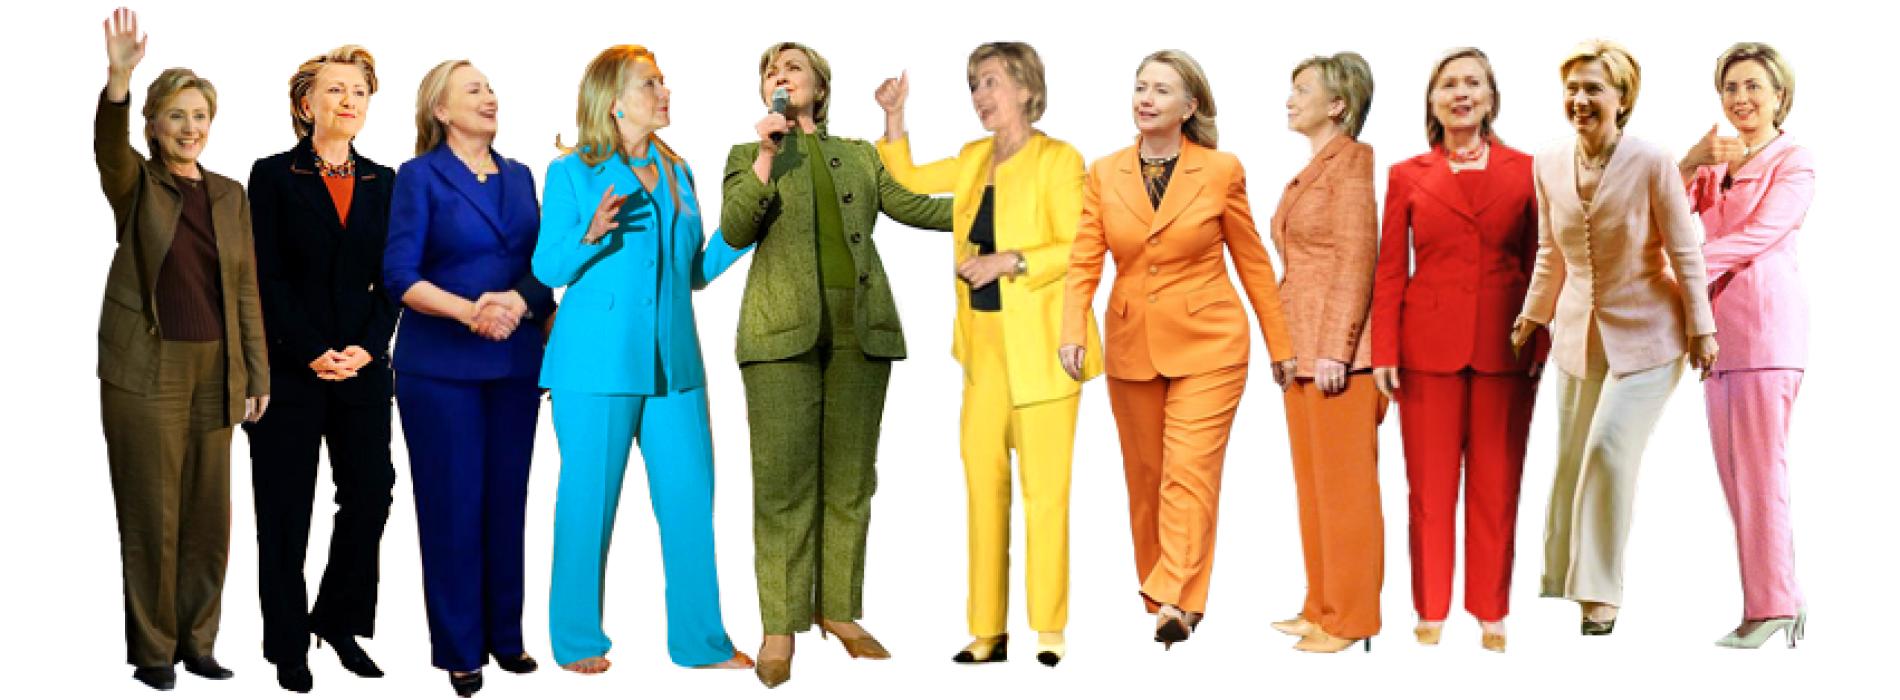 hillary pantsuit rainbow design inspo rando cool stuff